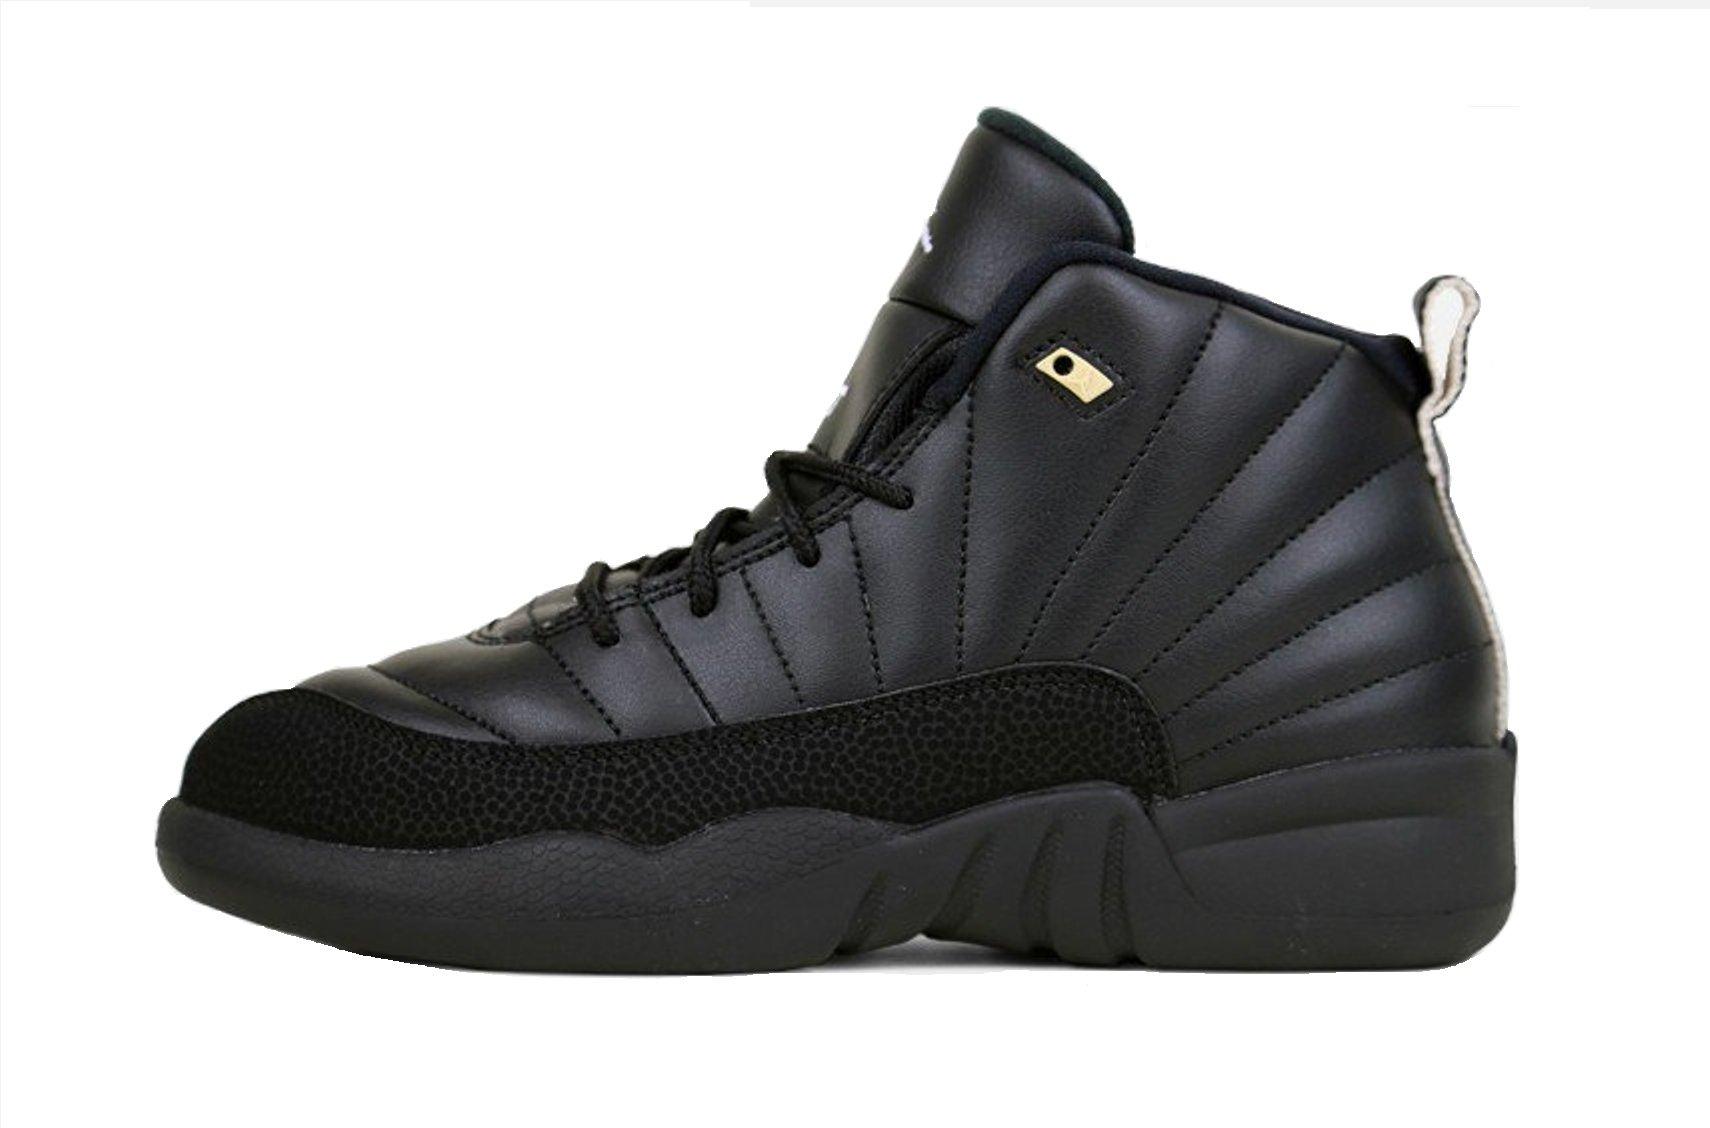 Nike Air Jordan Retro 12 THE MASTER Preschool P.S Black Rattan White Metallic Gold 151186-013 (12)